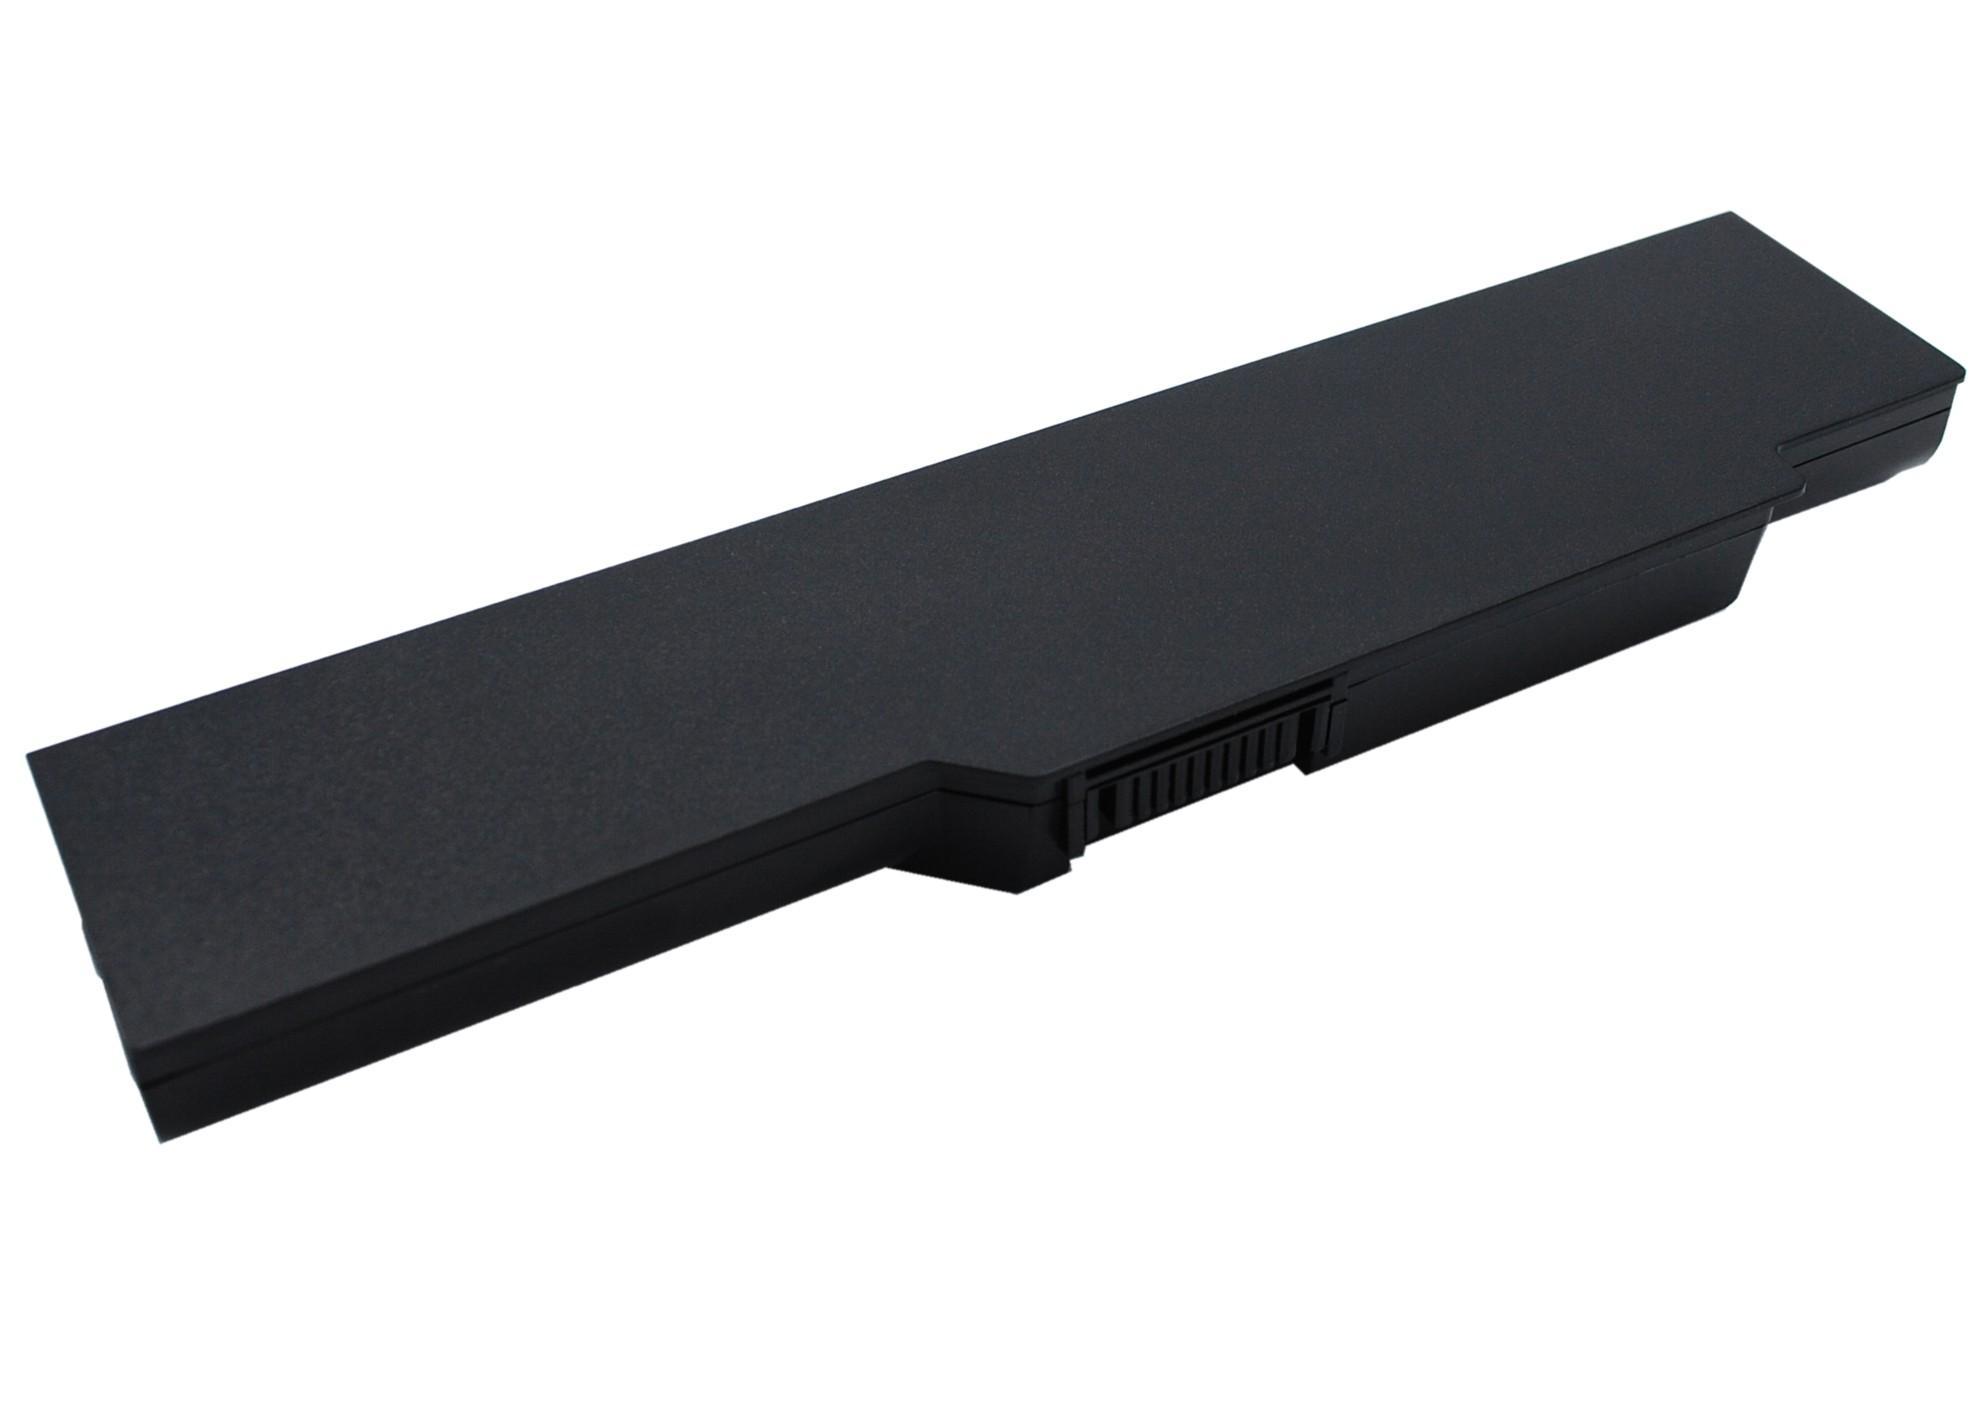 Батерия  за лаптоп LENOVO G400S, 10.8V, 4400mAh, Черен, Cameron sino